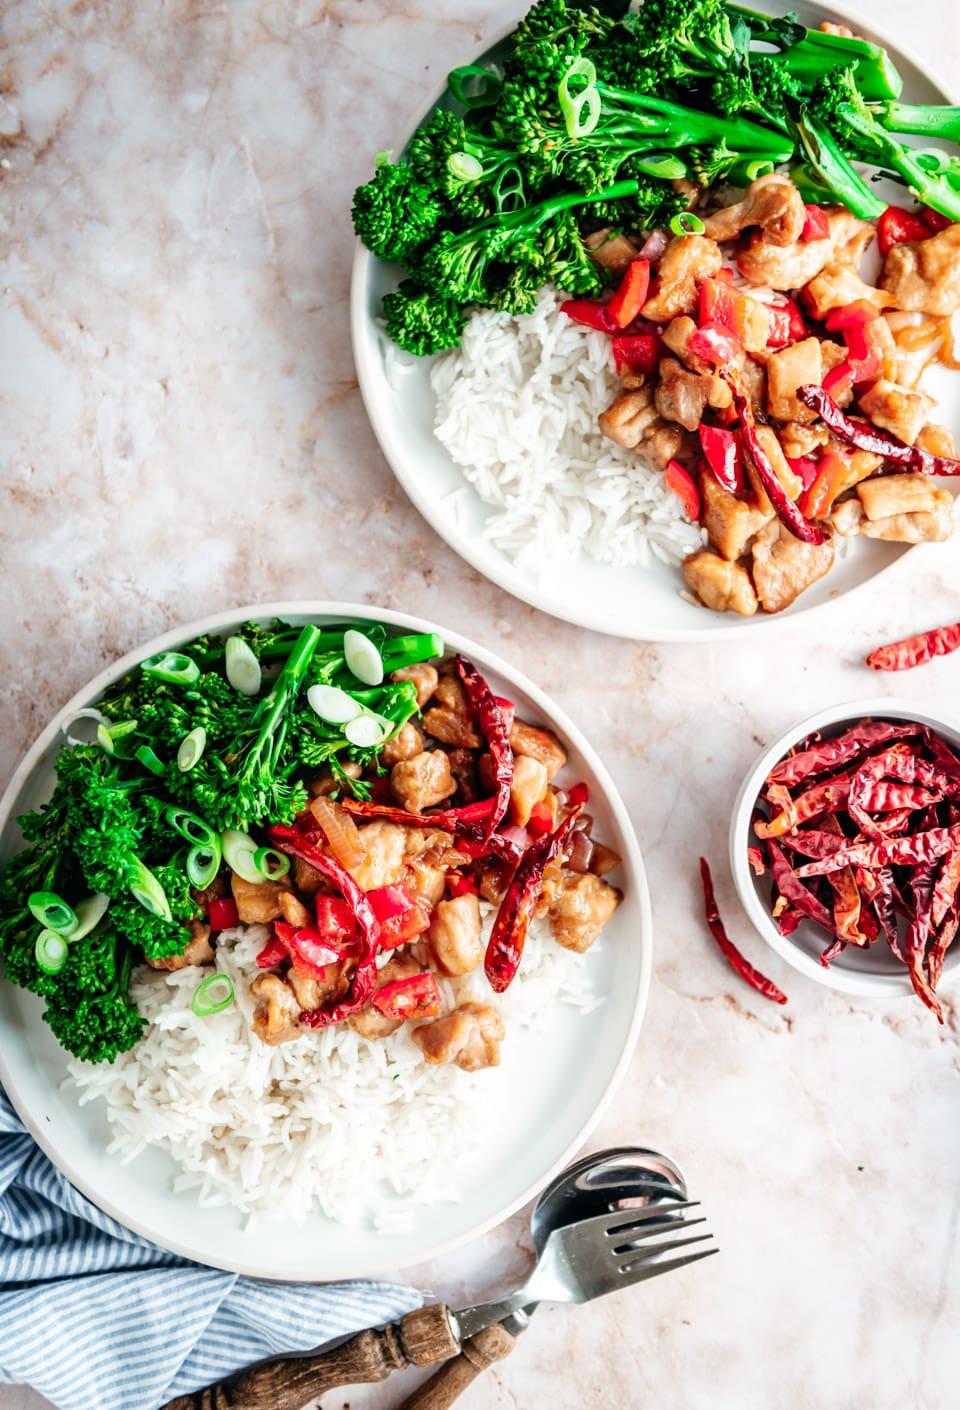 Kung pao chicken recept